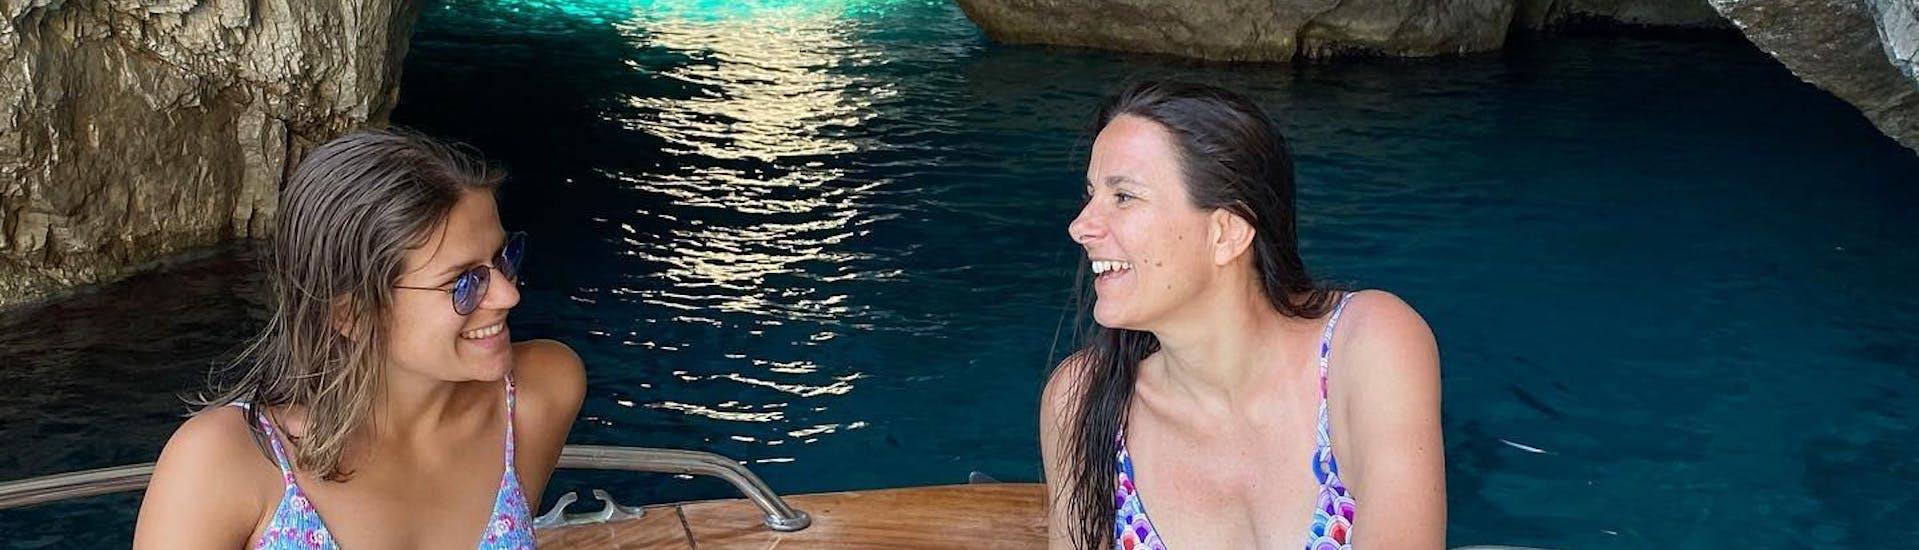 private-boat-trip-from-naples-to-capri-incl-blue-grotto-hero